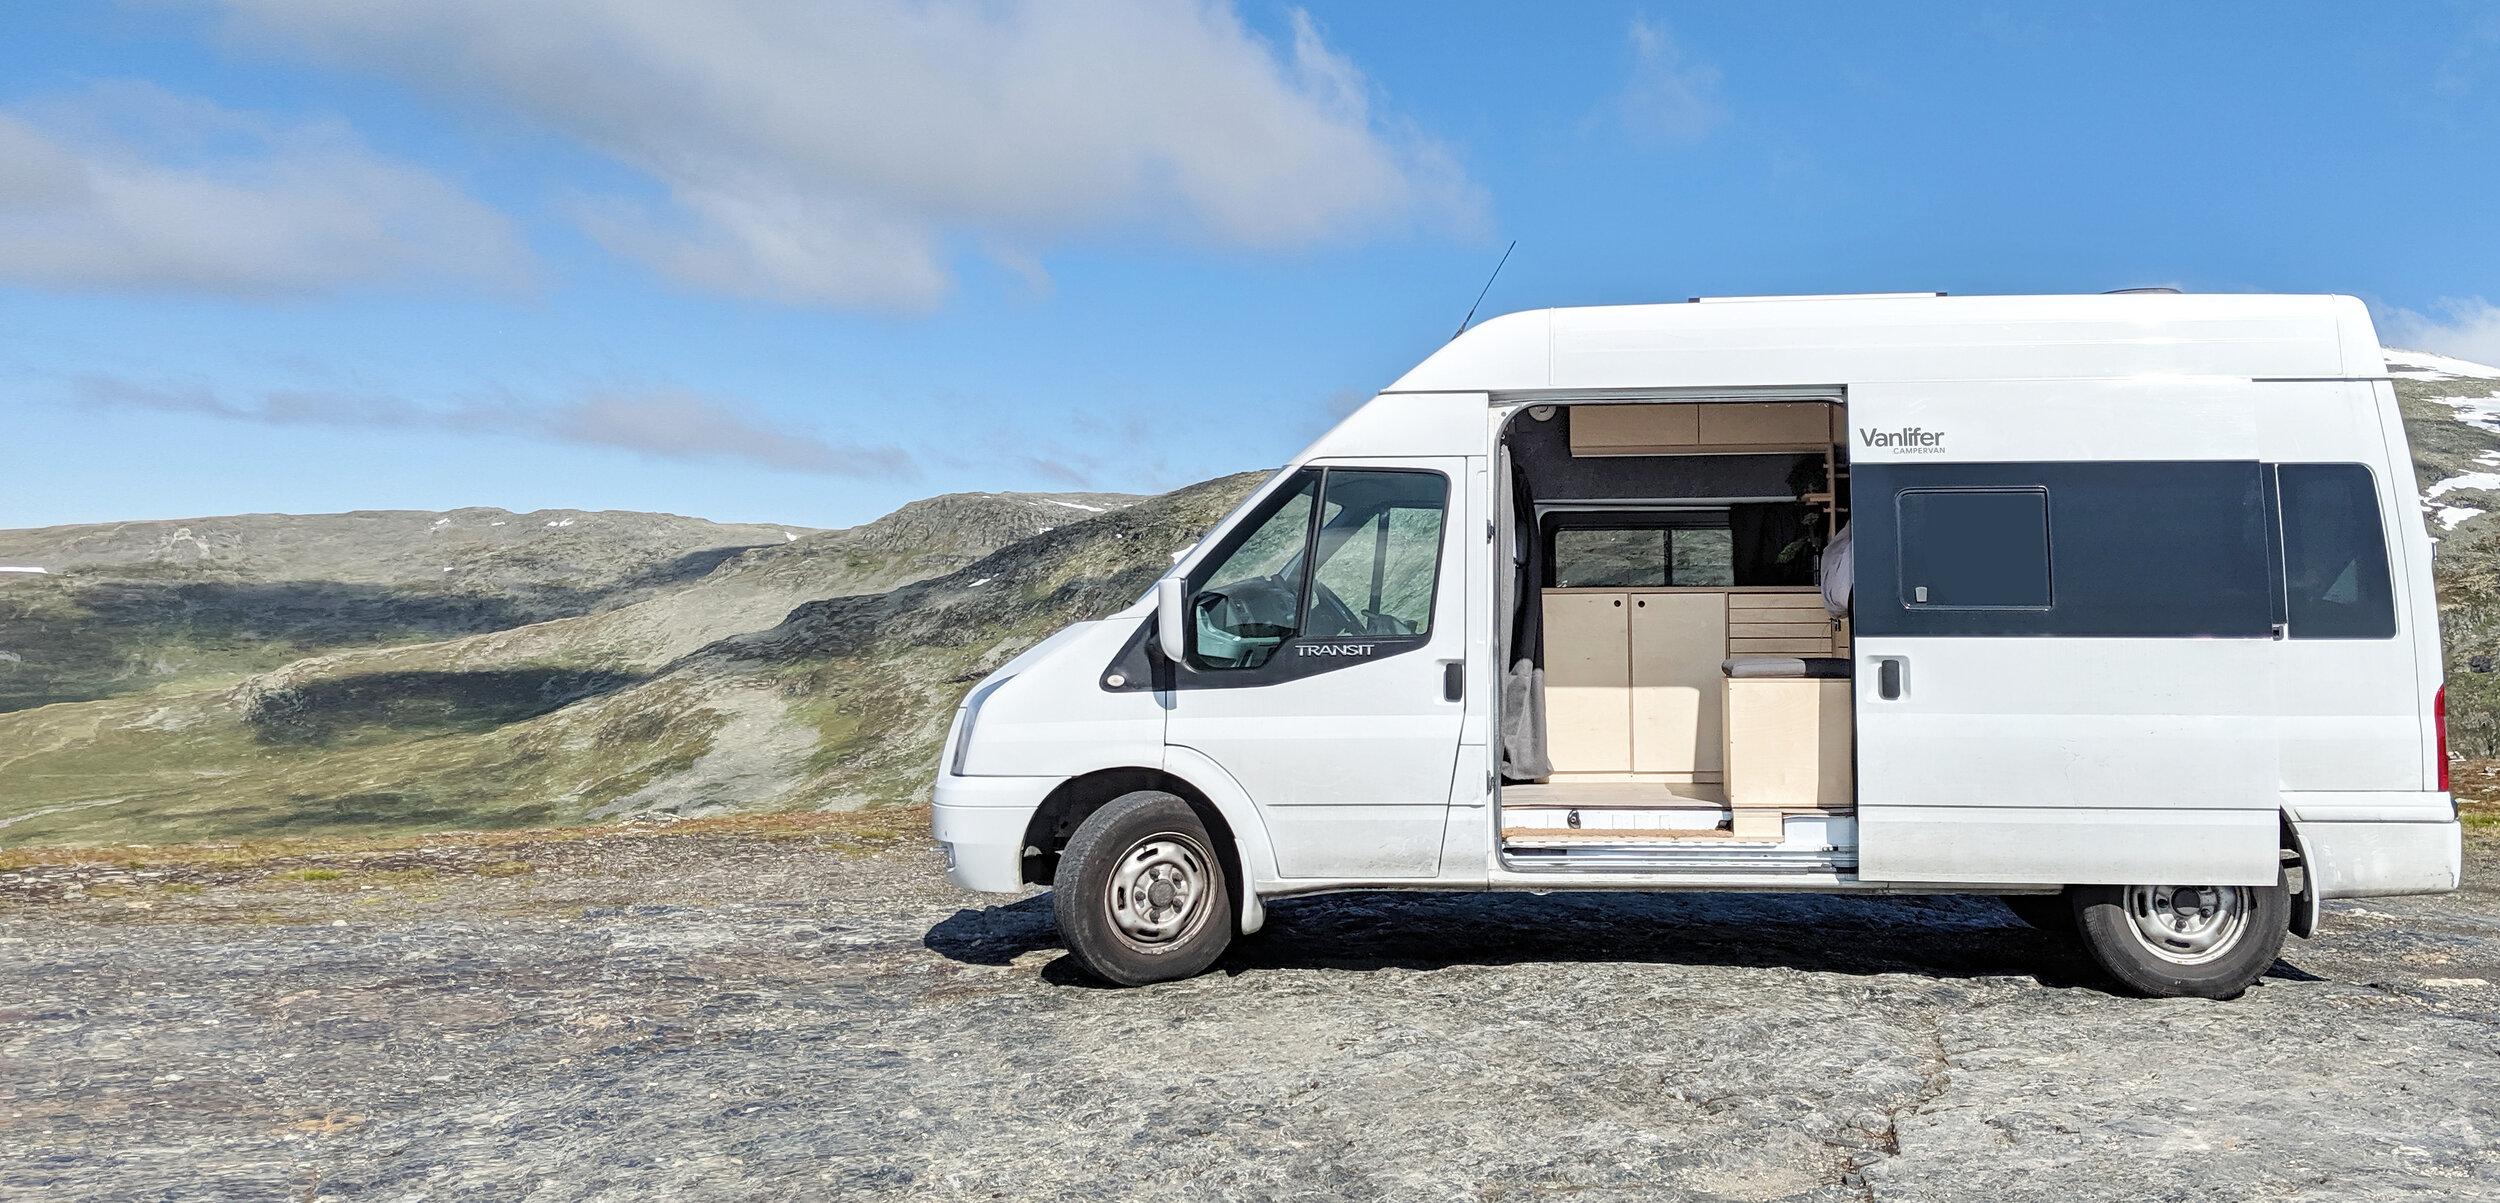 VANLIFER - Custom campervans and rentals